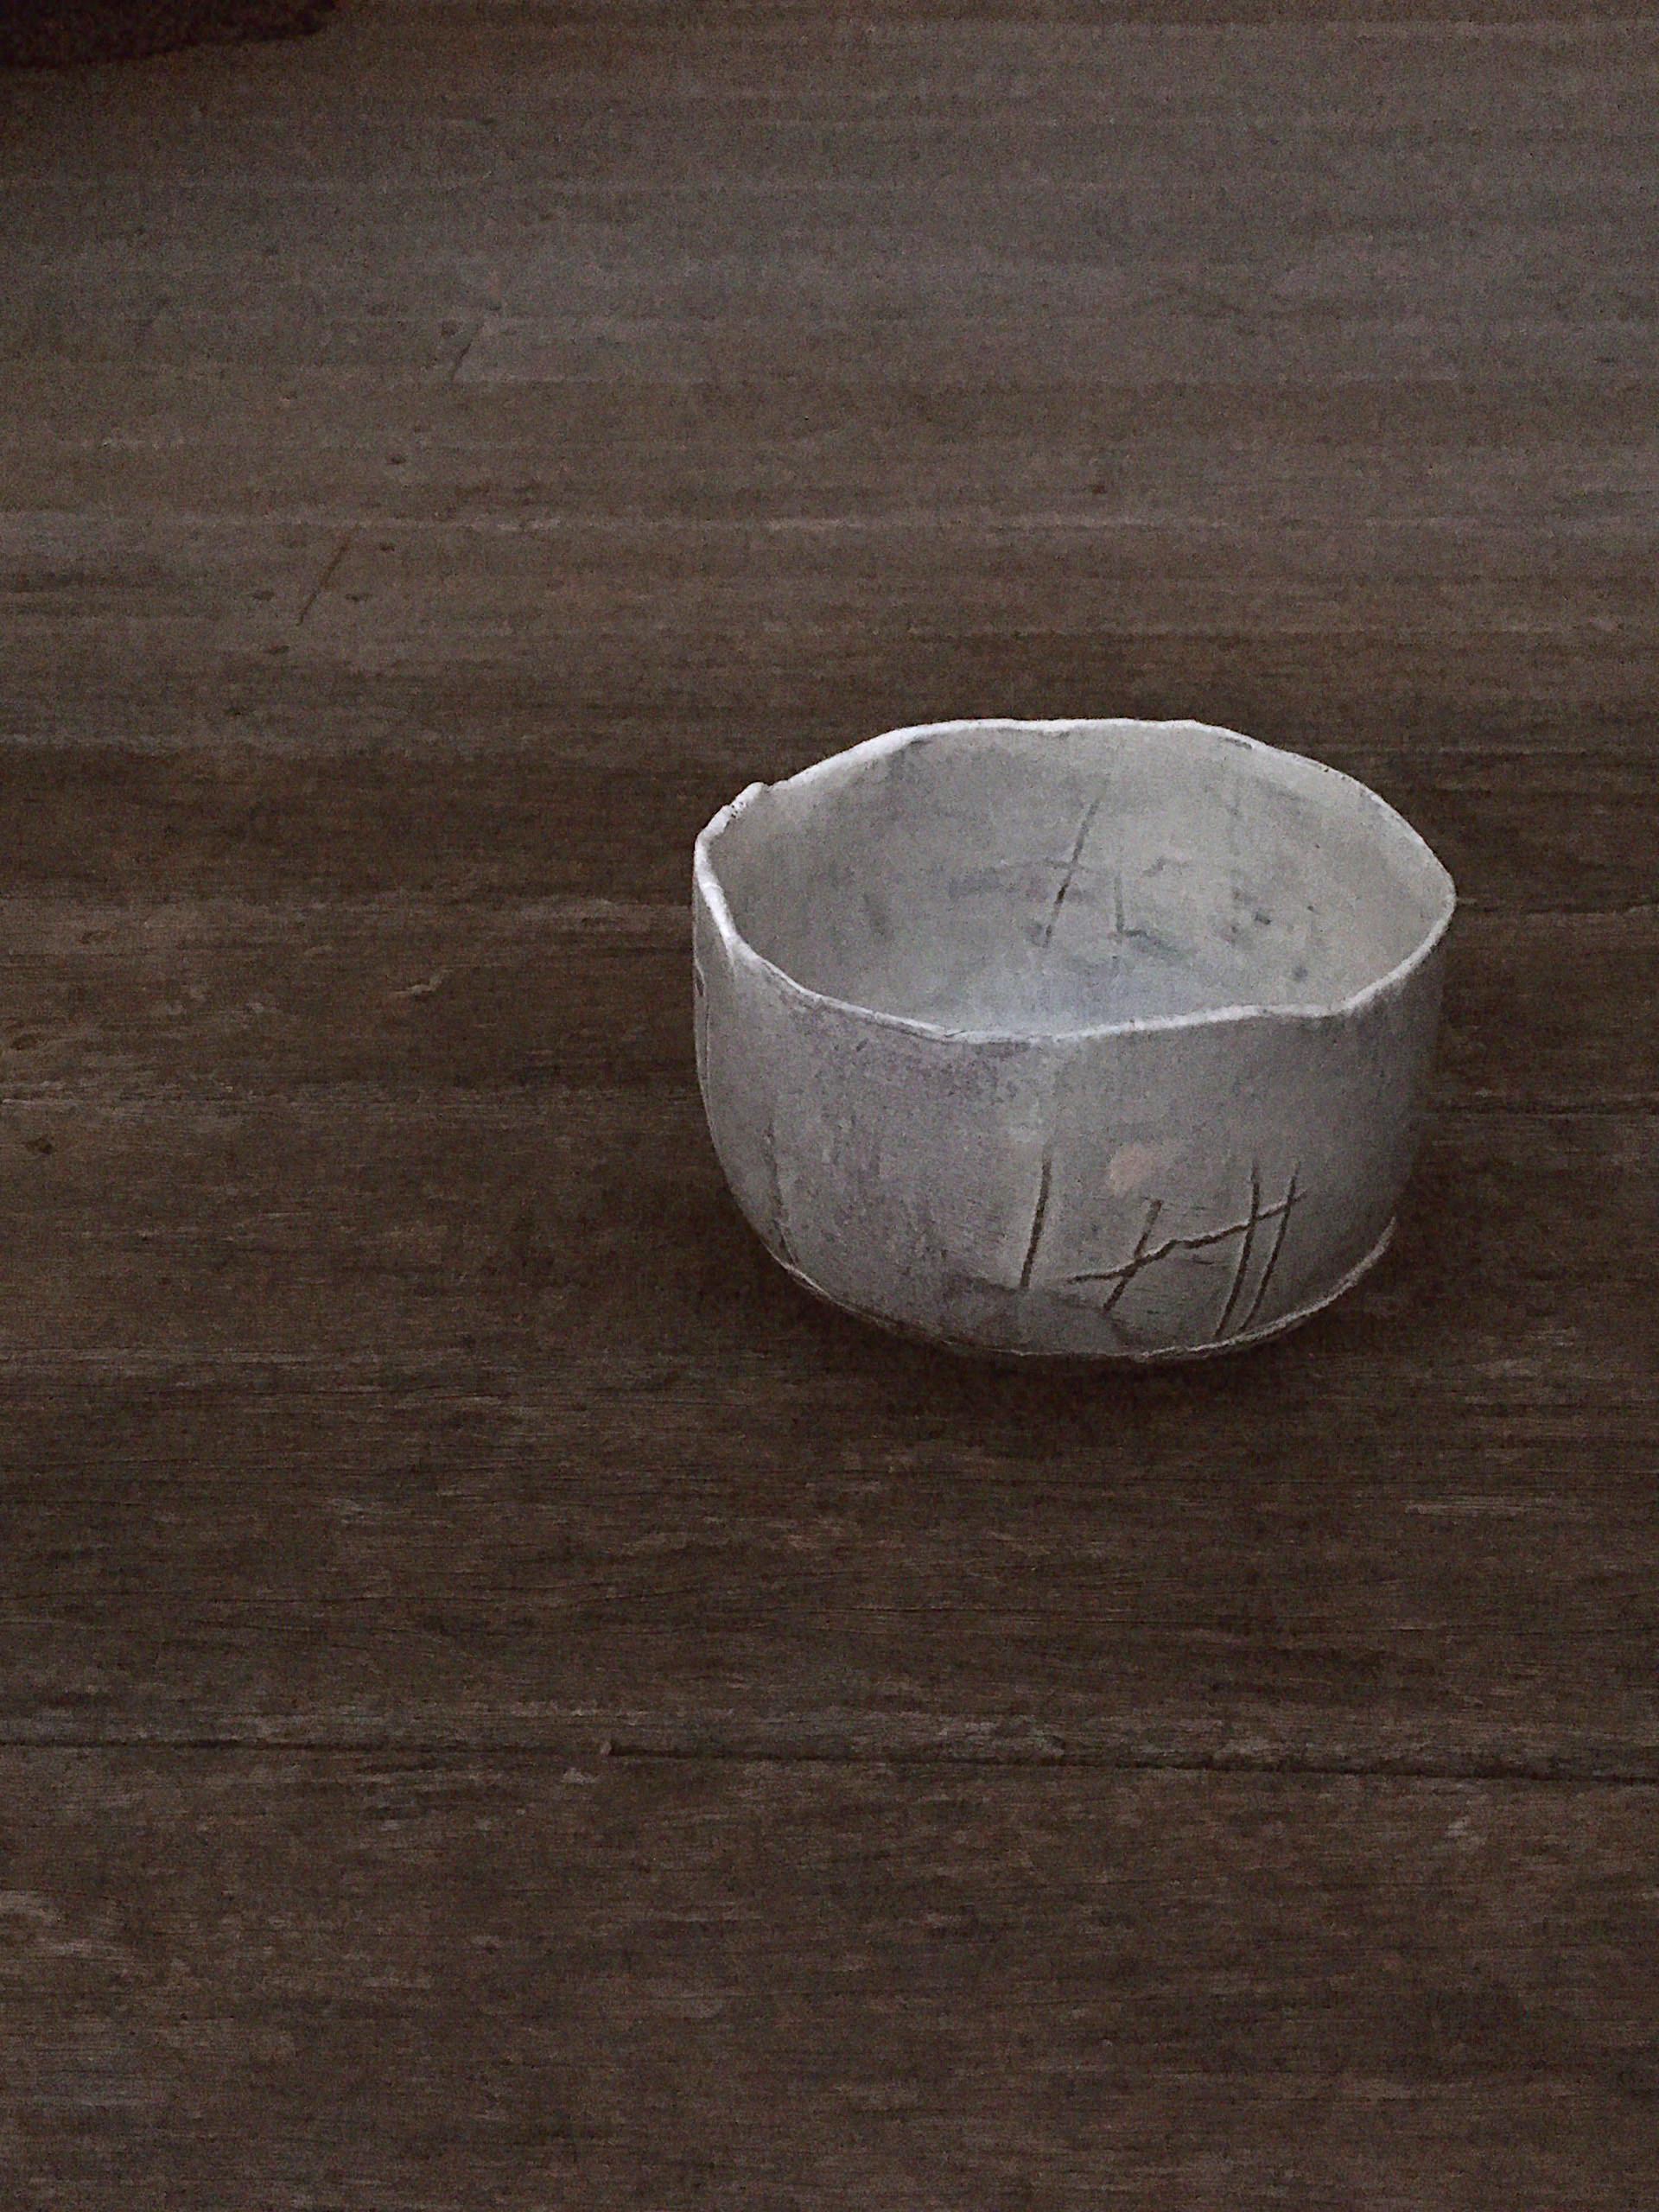 tania rollond_wip bowl_2019.jpg